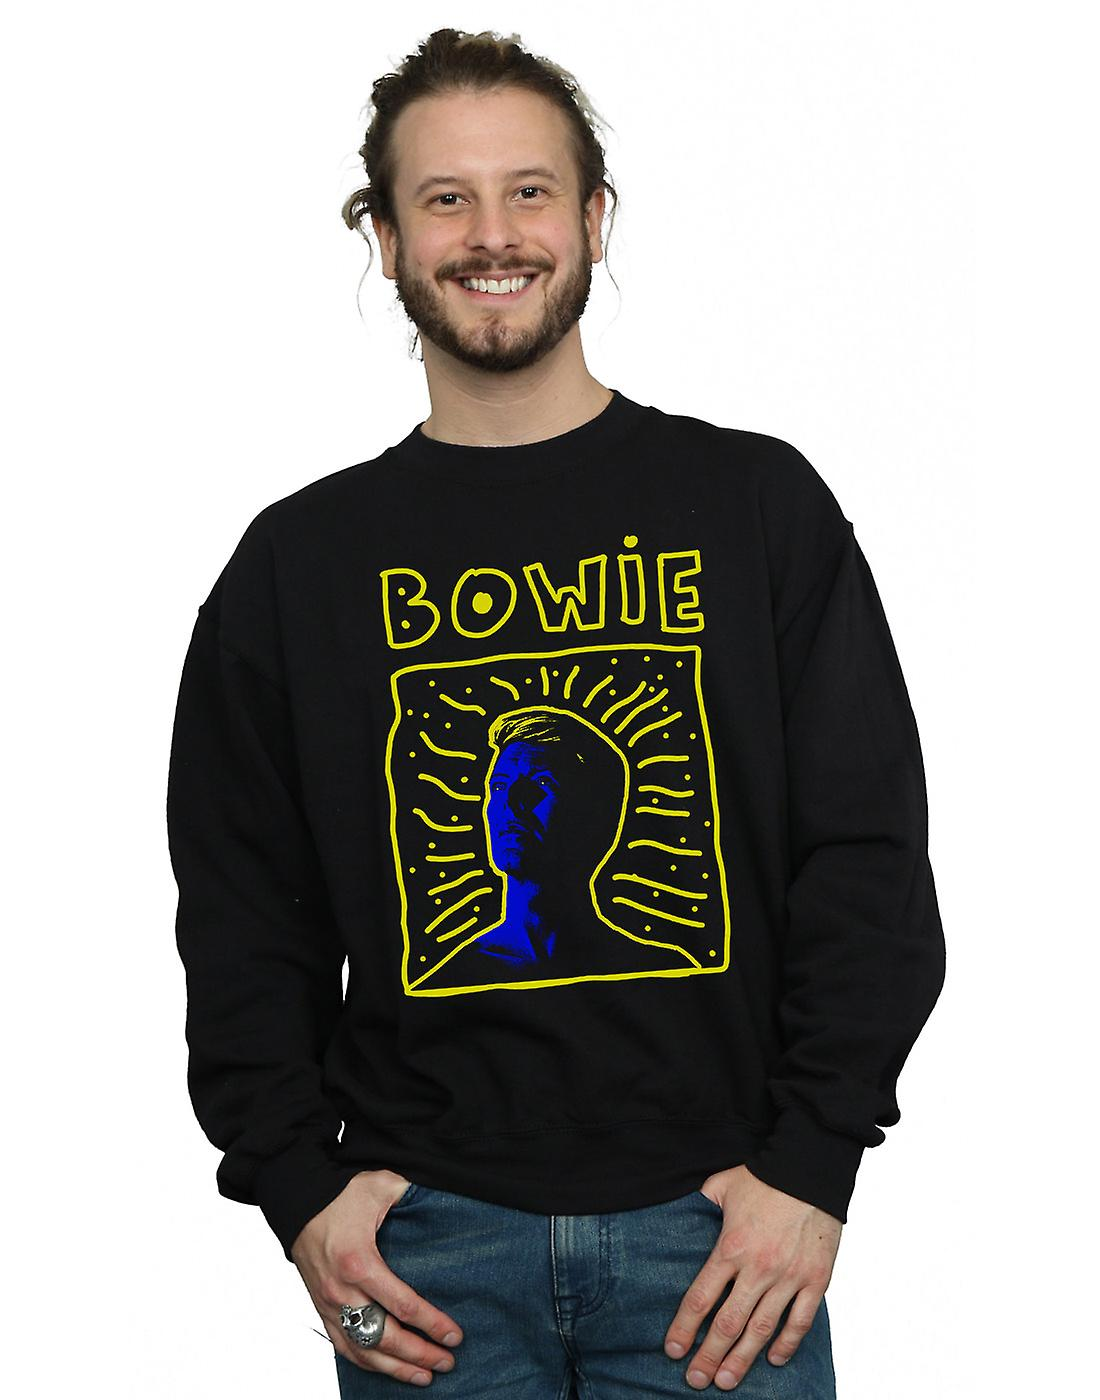 David Bowie Men's 90s Frame Sweatshirt